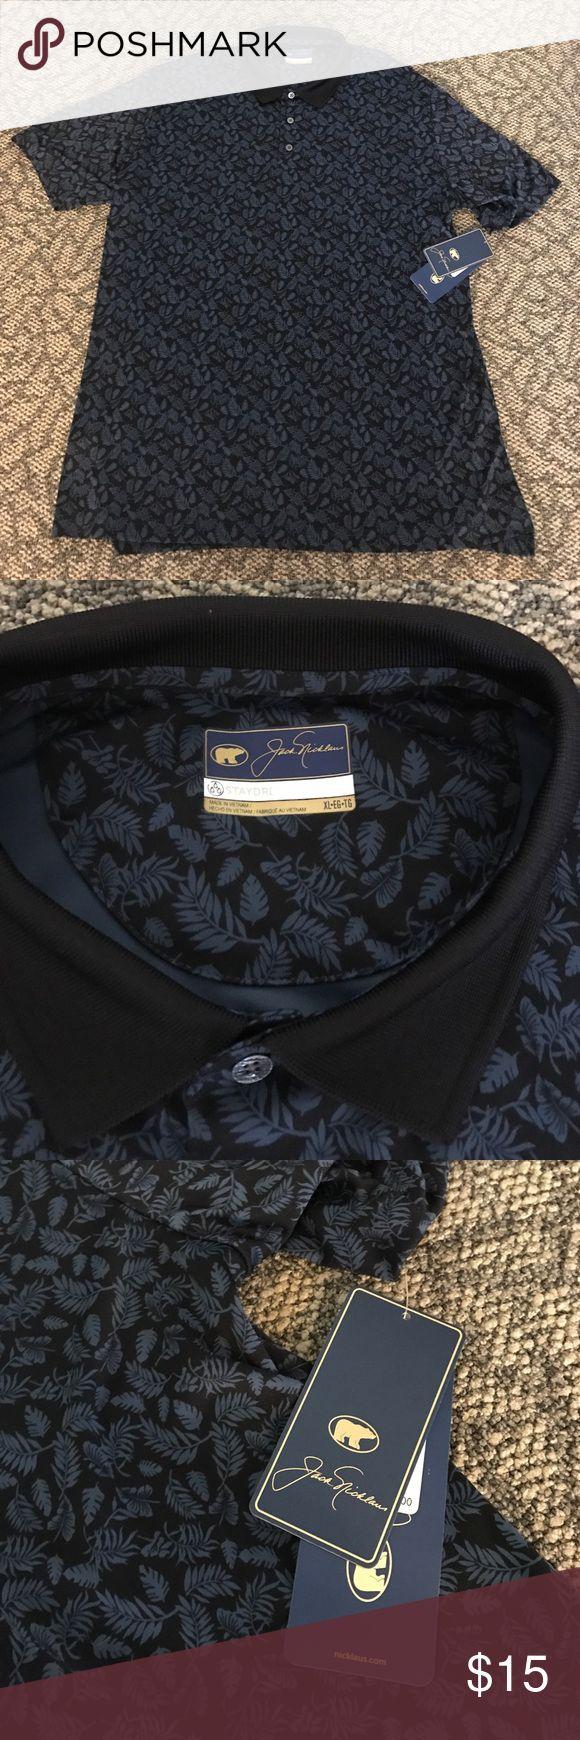 Jack Nicklaus Stay Dri Size XL Golf Polo Shirt Jack Nicklaus stay dri golf polo shirt size XL. New jack nicklaus Shirts Polos